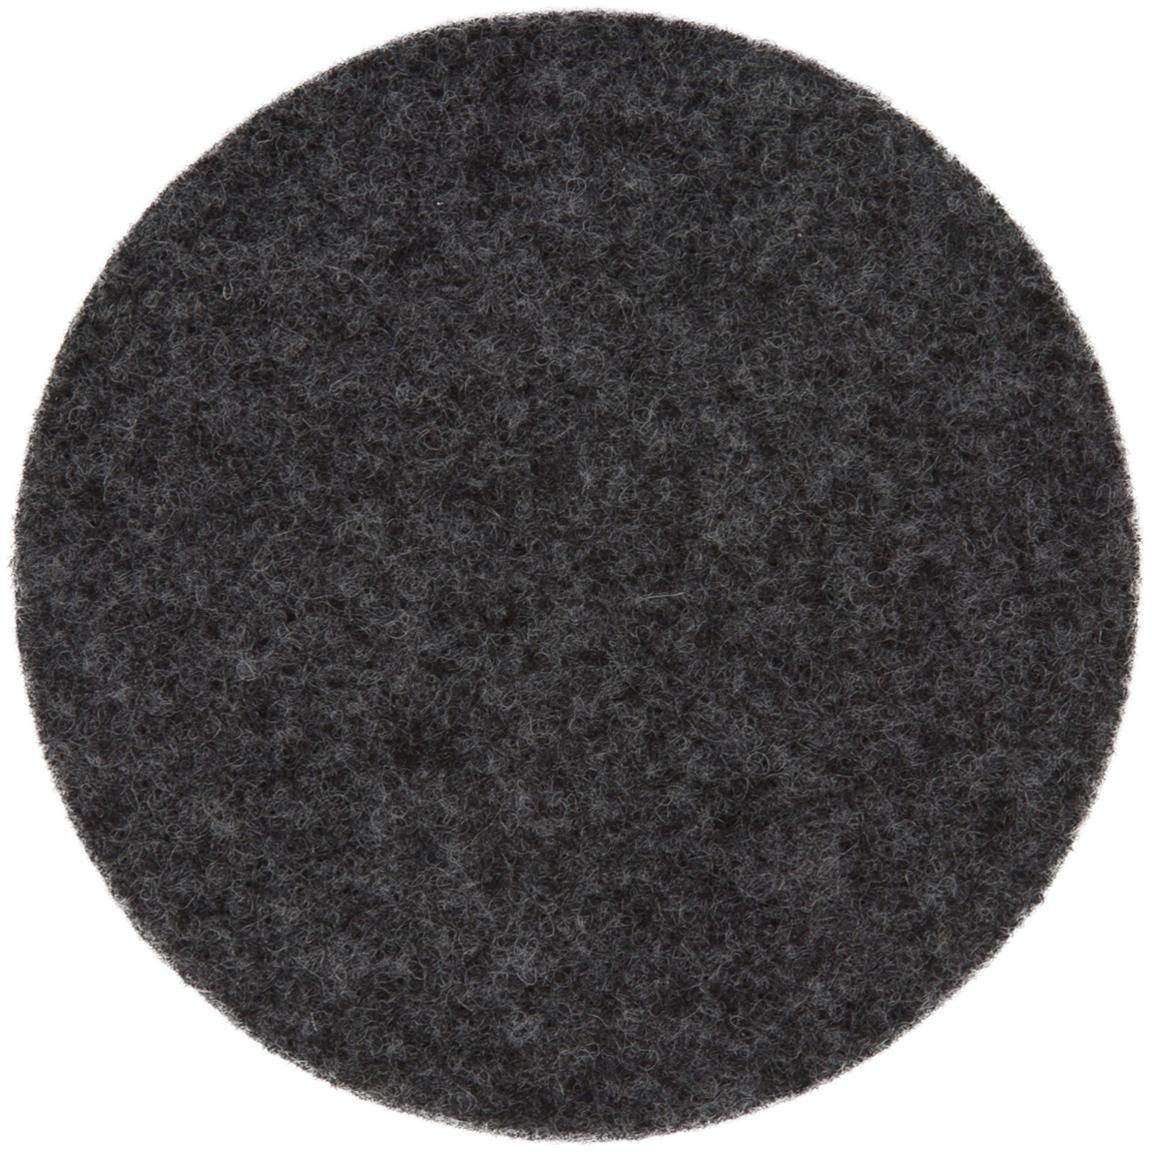 Sottobicchiere in feltro di lana Leandra, 6 pz., 90% lana, 10% polietilene, Antracite, Ø 10 cm